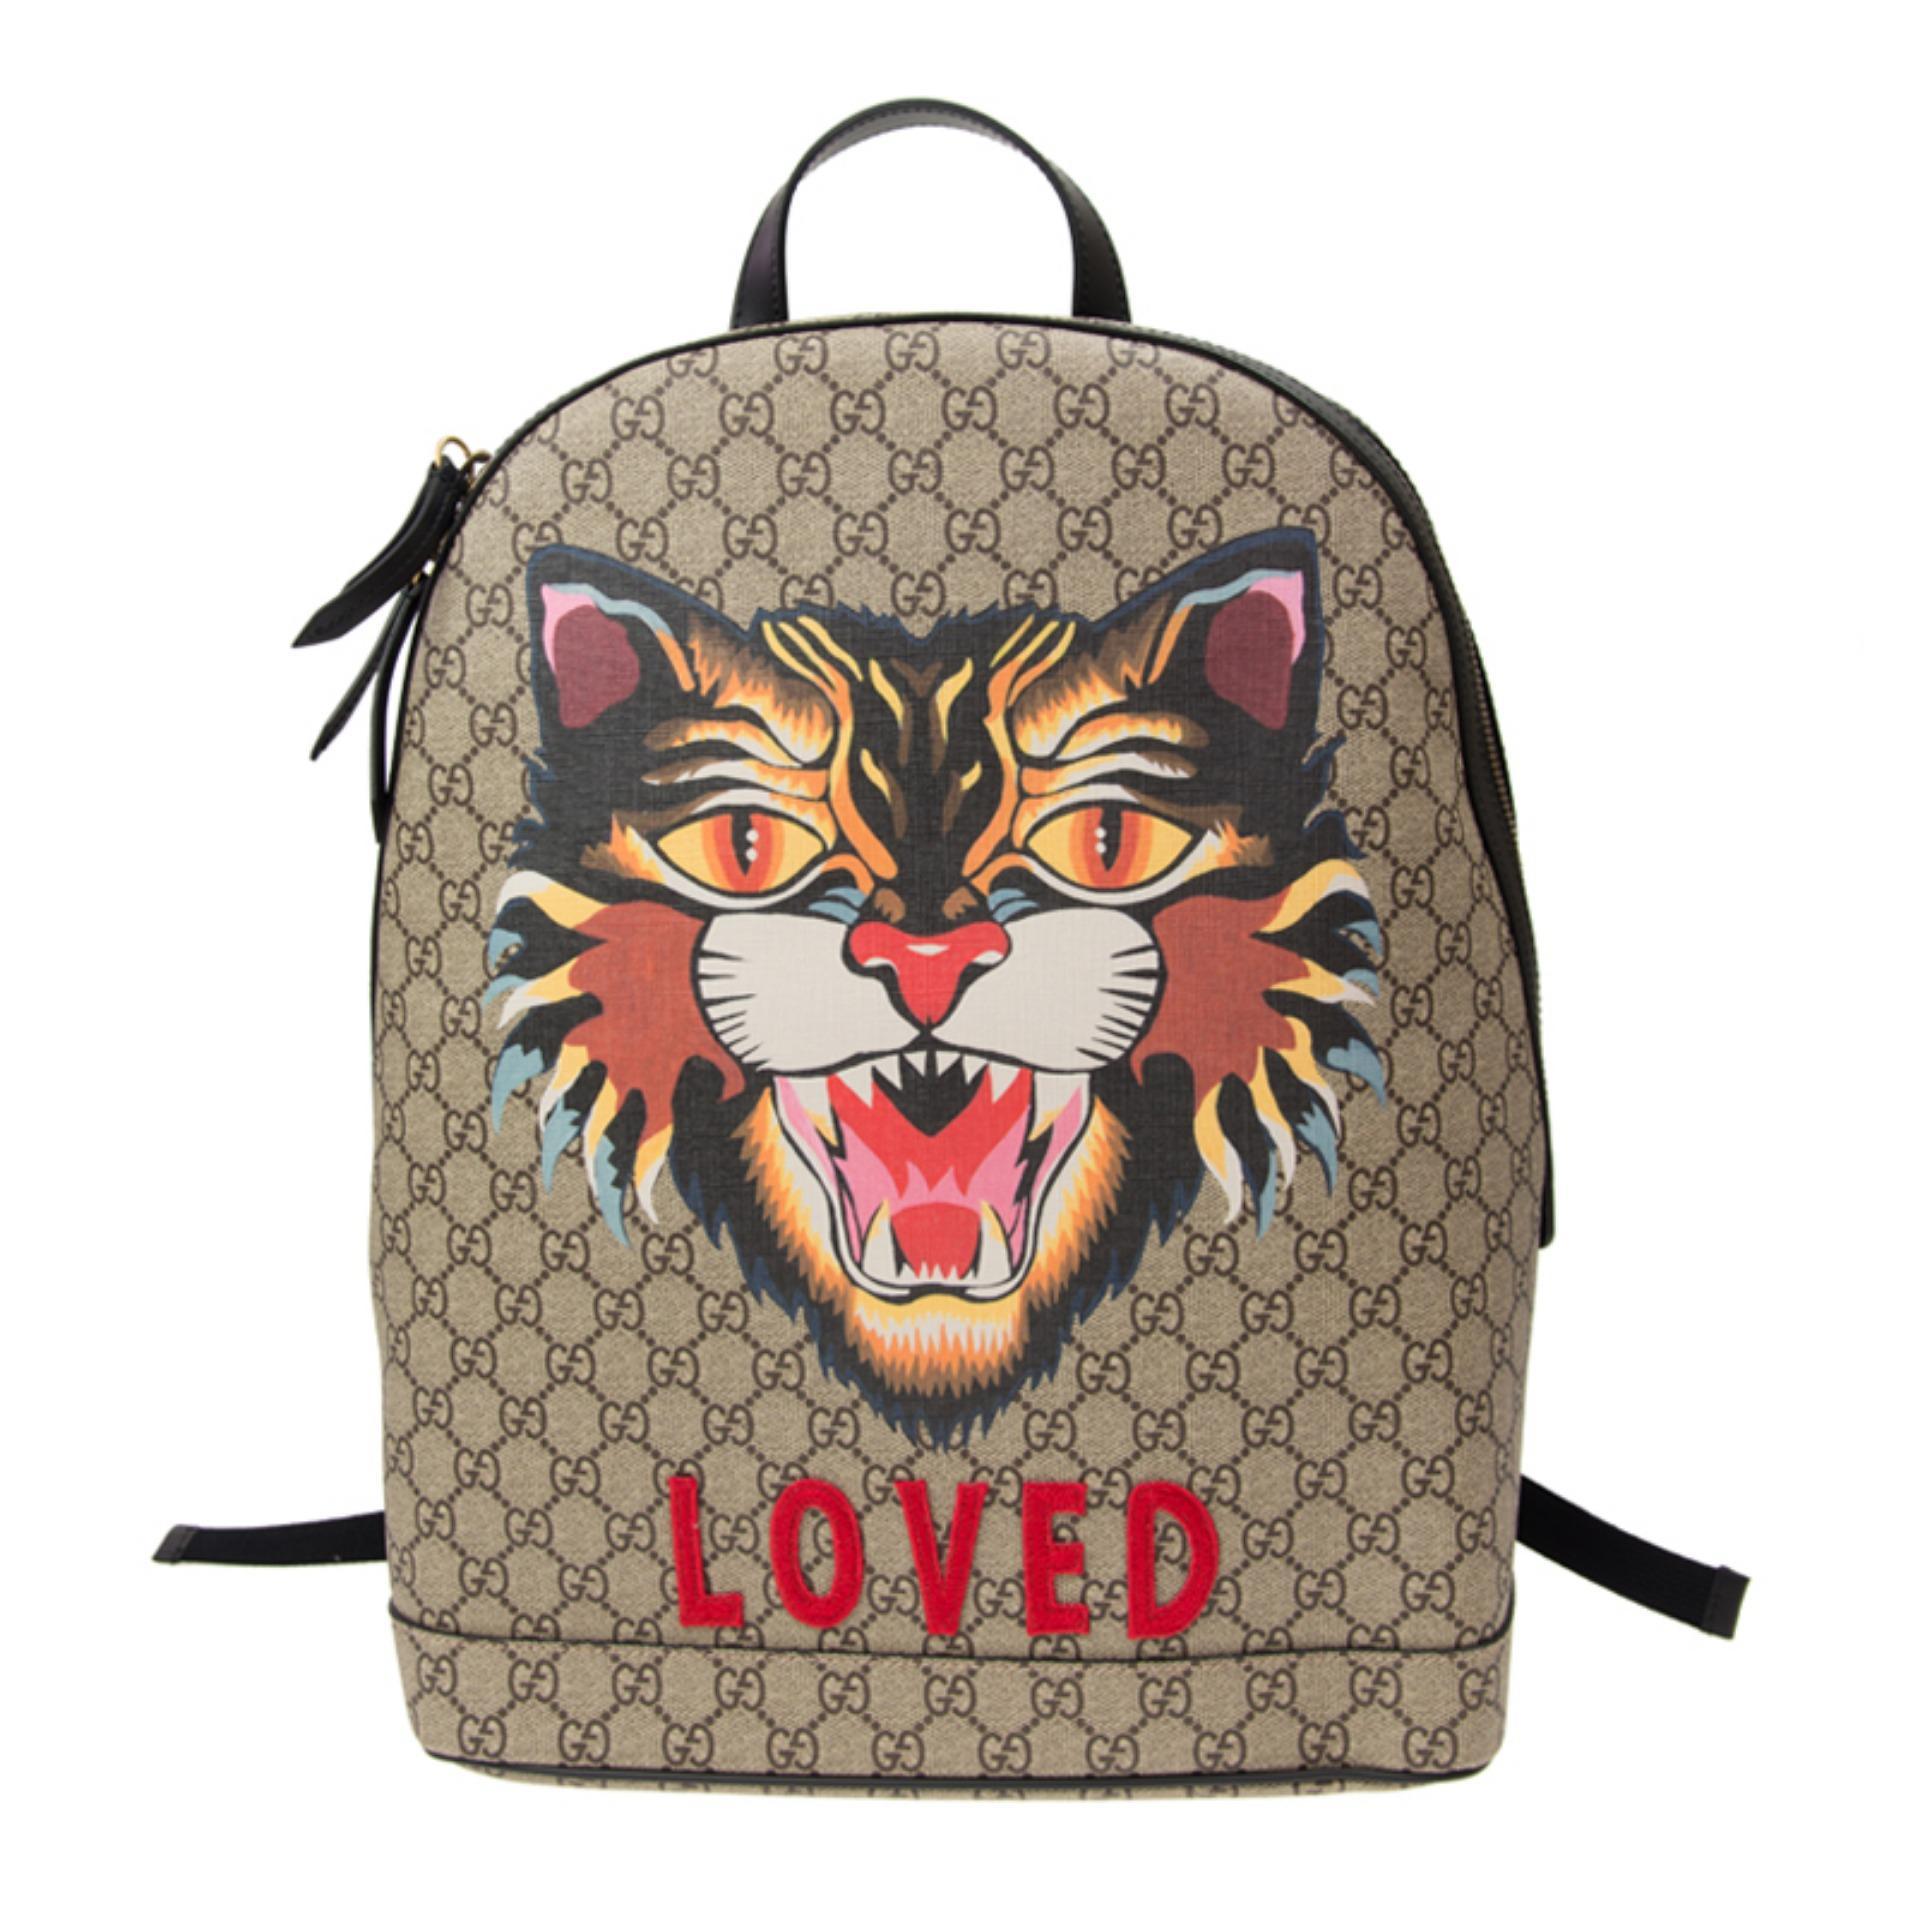 17f8d59fa188 Gucci Angry Cat Print GG Supreme Backpack (Prints) # 4195849AX1T8652